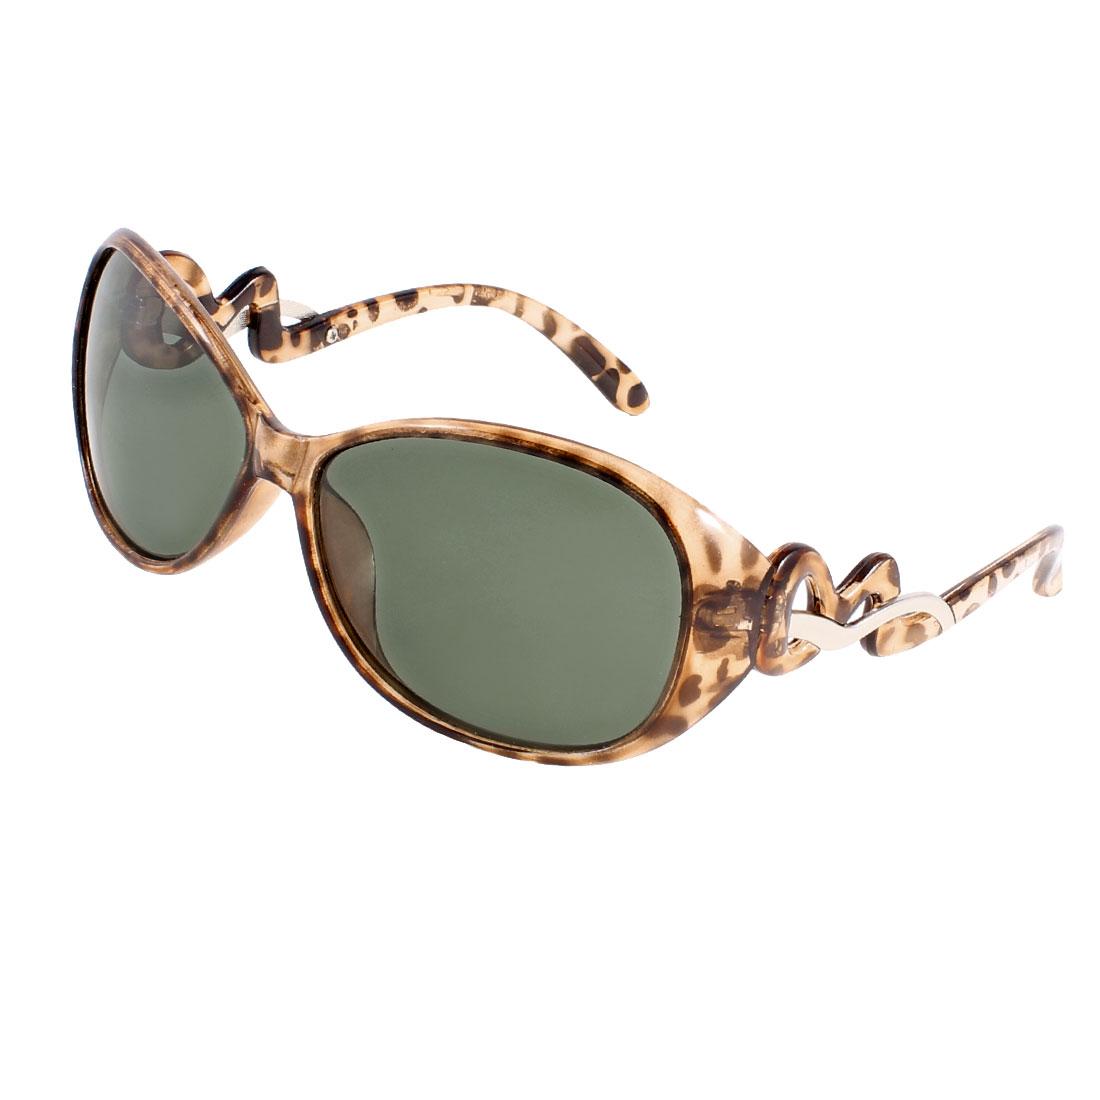 Woman Brown Plastic Full Rim Single Bridge Polarized Sunglasses